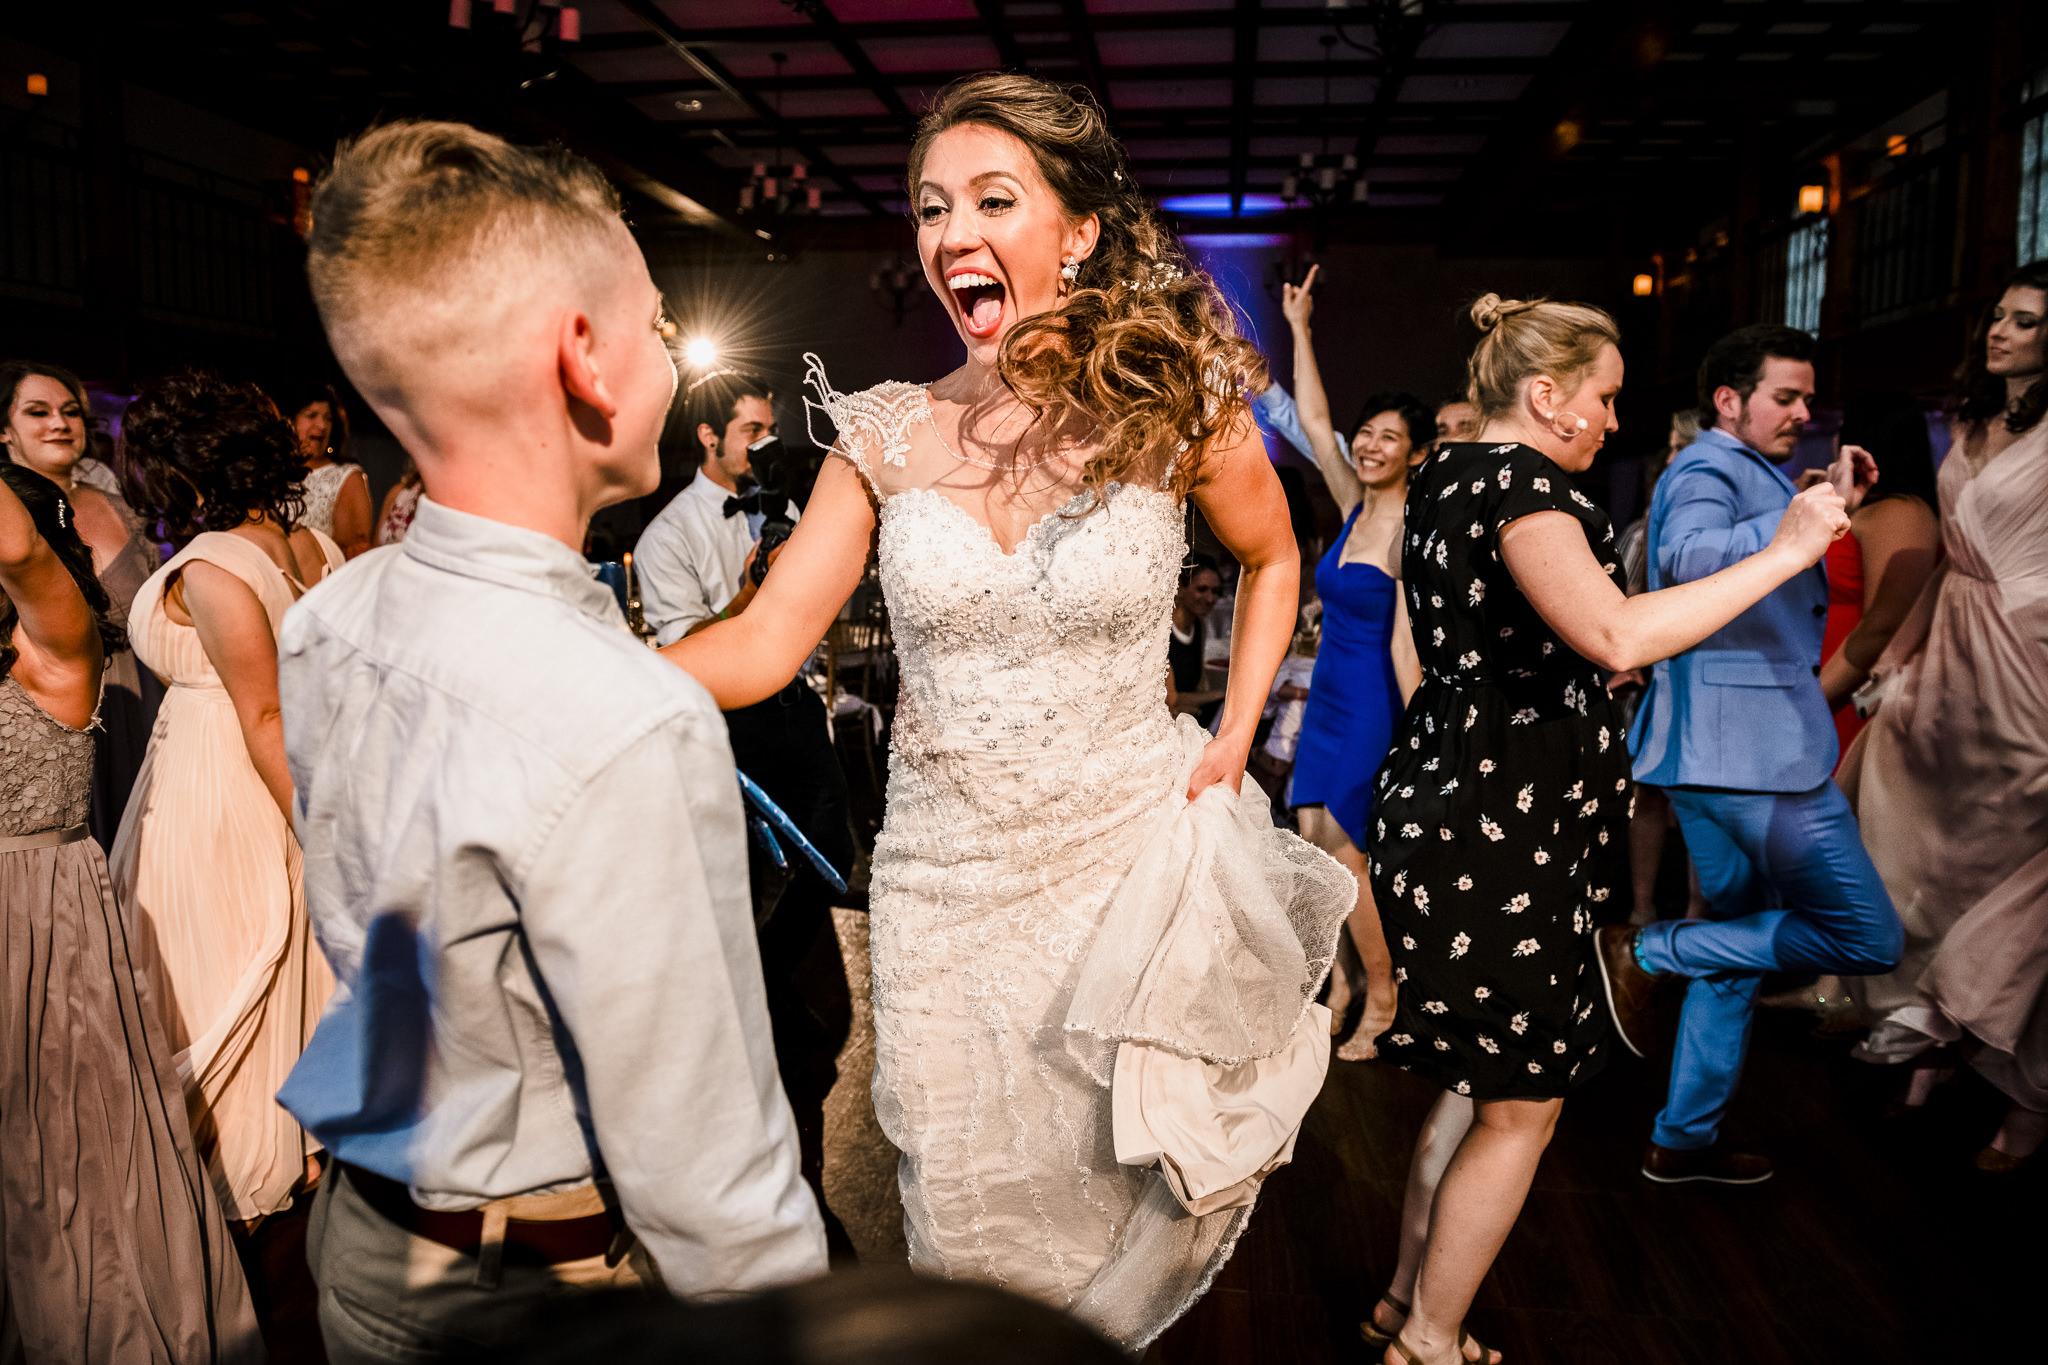 Barbato-Moorestown-Community-House-Wedding-New-Jersey-Photographer-35.JPG